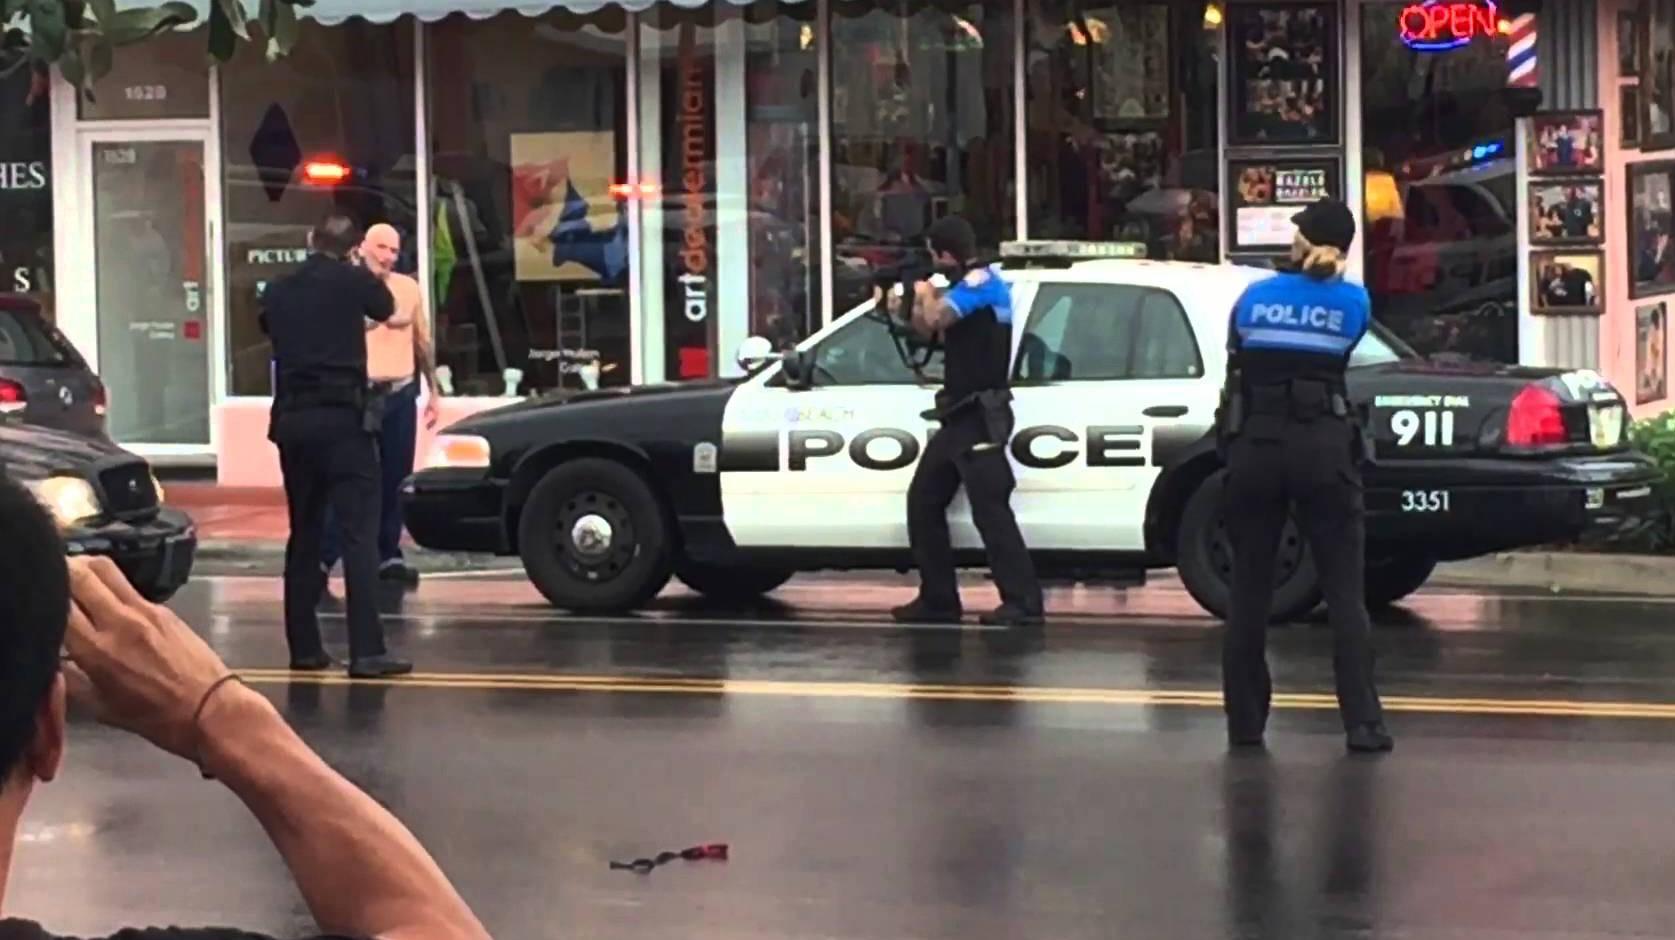 miami beach police shooting, miami police shooting, miami beach police shooting video, miami beach police shooting watch